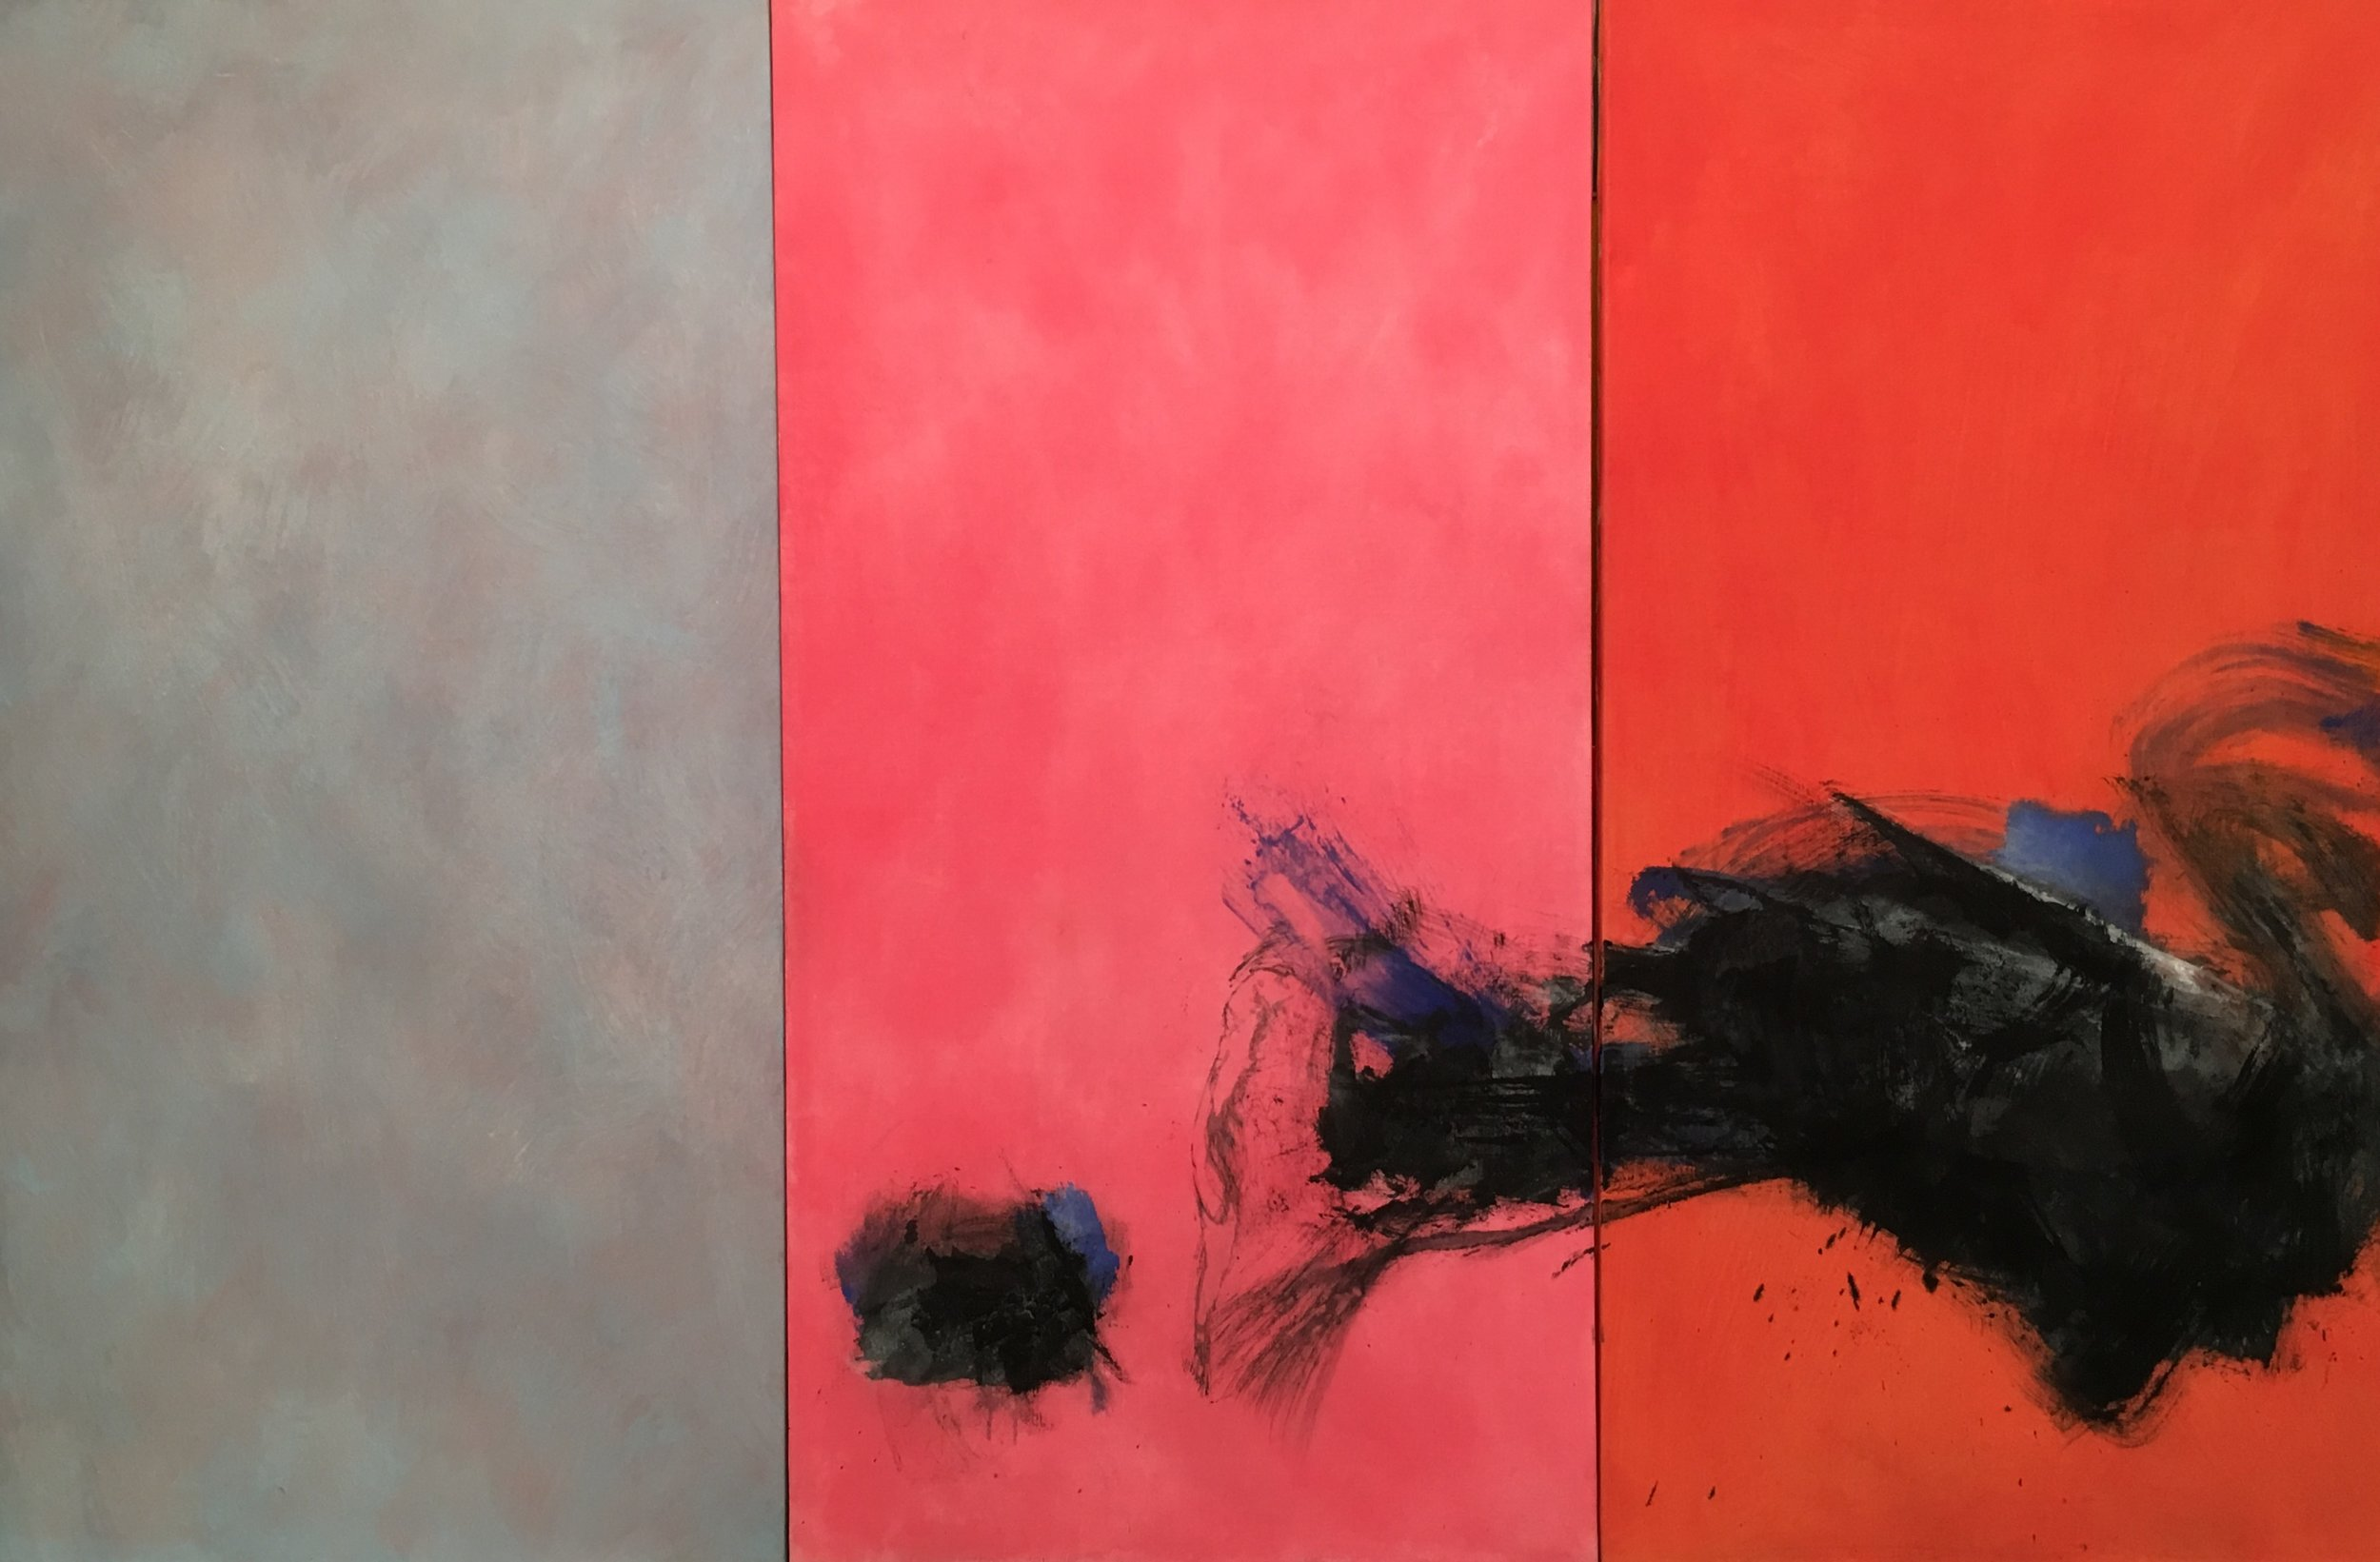 Reach, 1981 - 1995 Triptych acrylic on canvas 72 x 108 1/2 inches